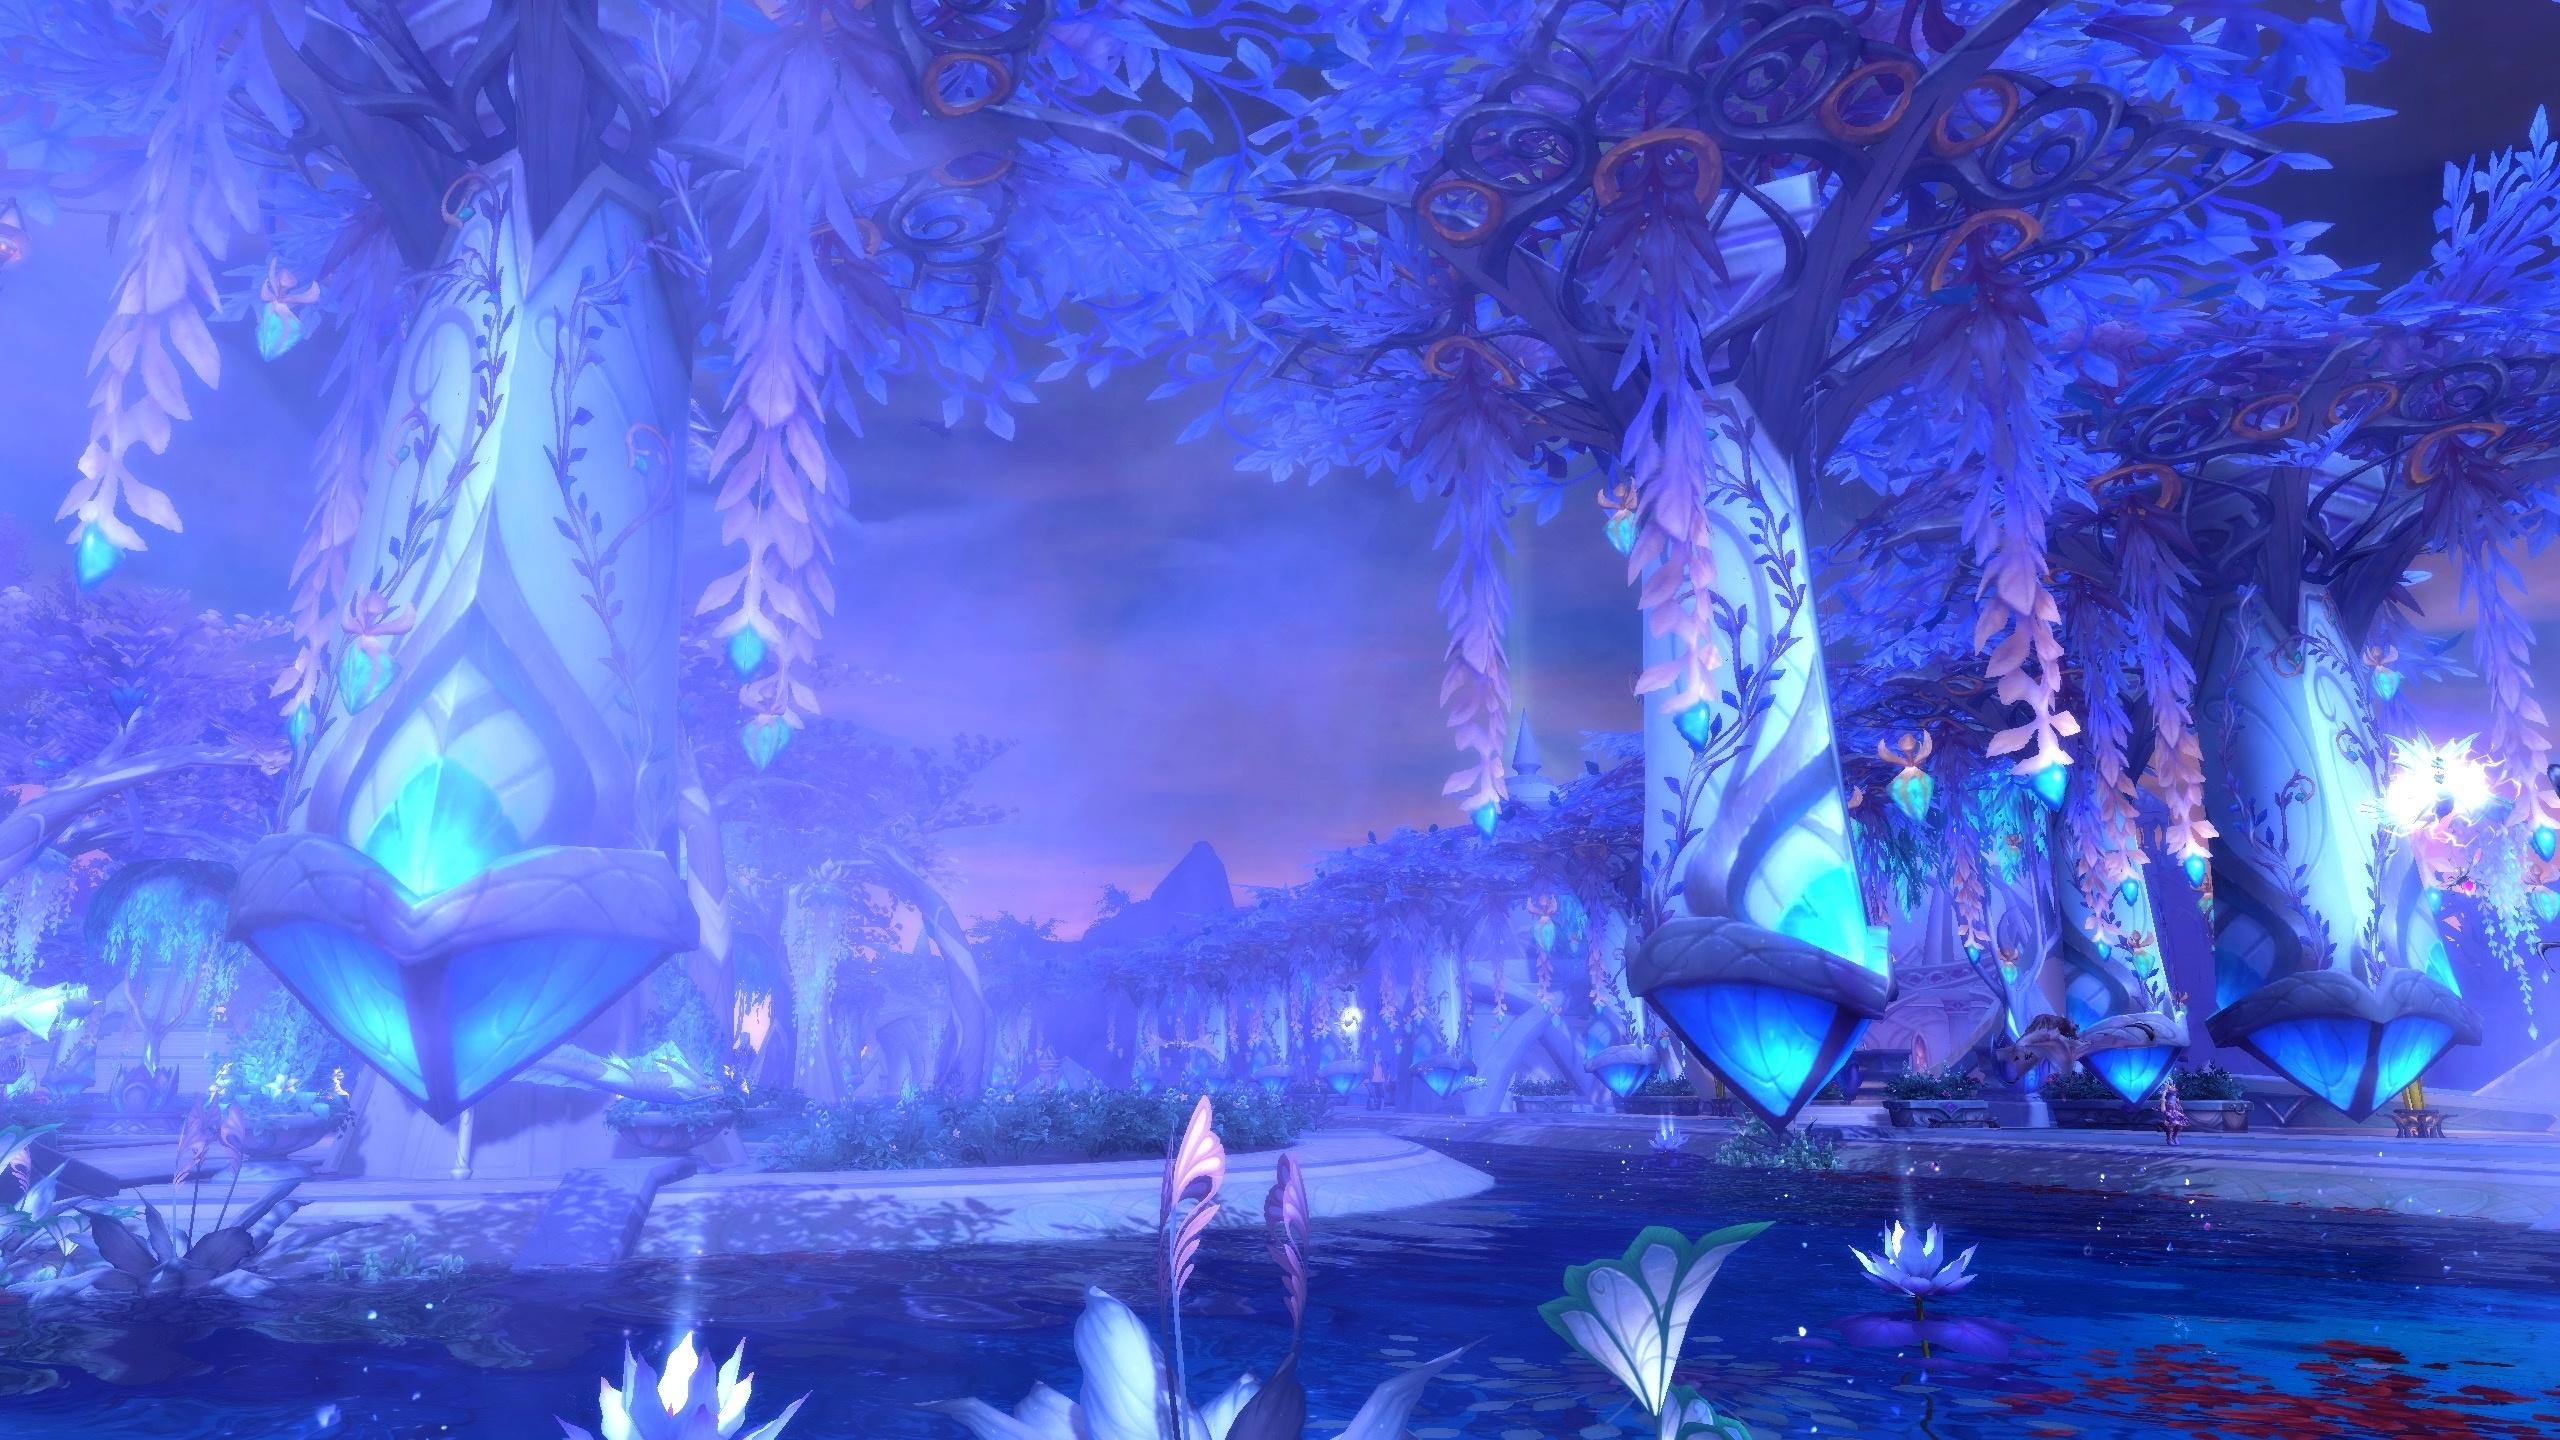 World Of Warcraft Wallpapers Hd Legion Alpha 苏拉玛的小动物园 Nga玩家社区 F476